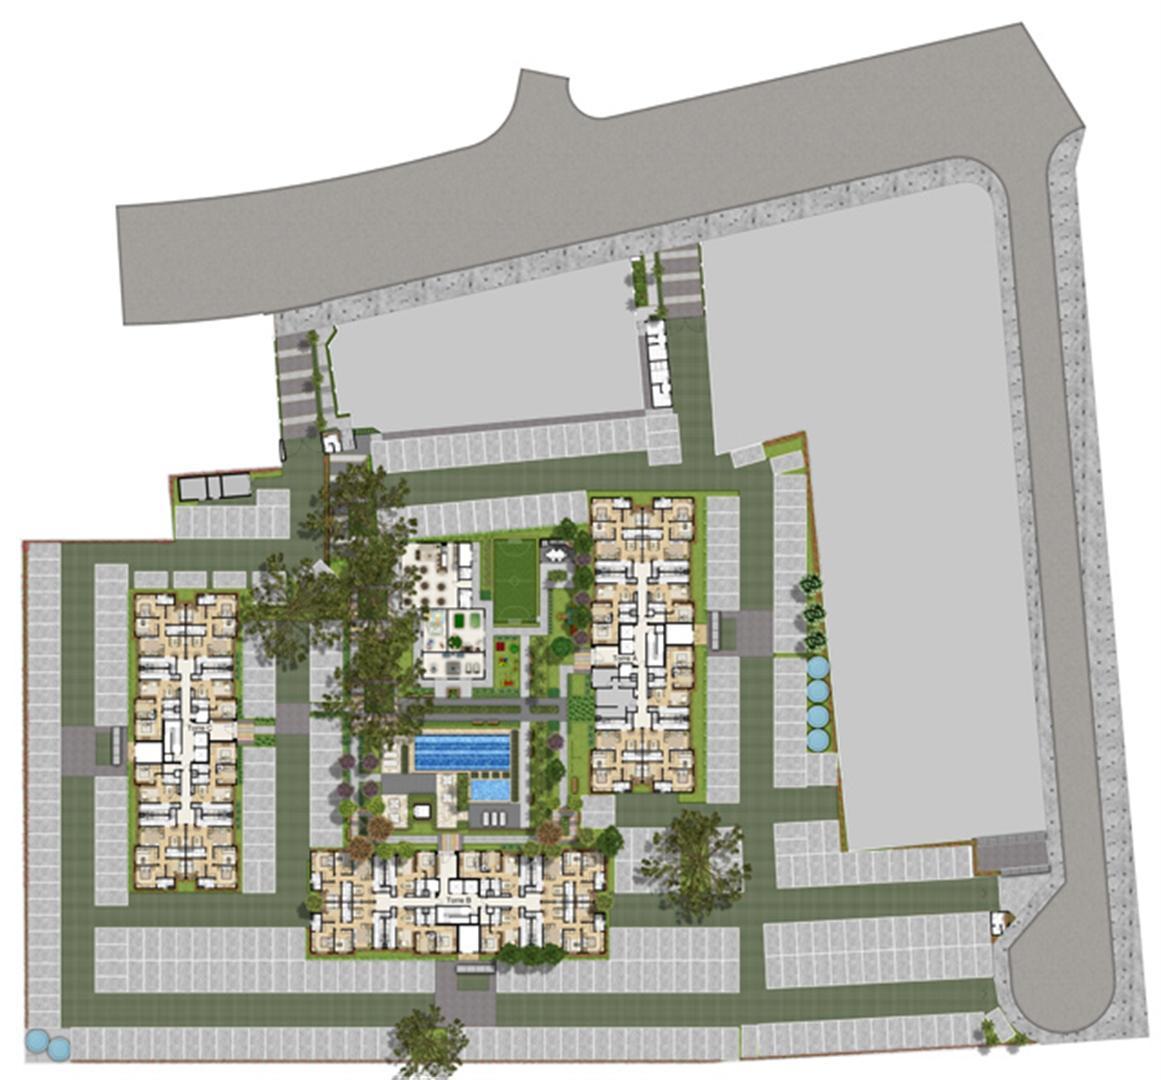 Perspectiva Ilustrada da Implantacao | Way – Apartamento  Junto ao Menino Deus - Porto Alegre - Rio Grande do Sul